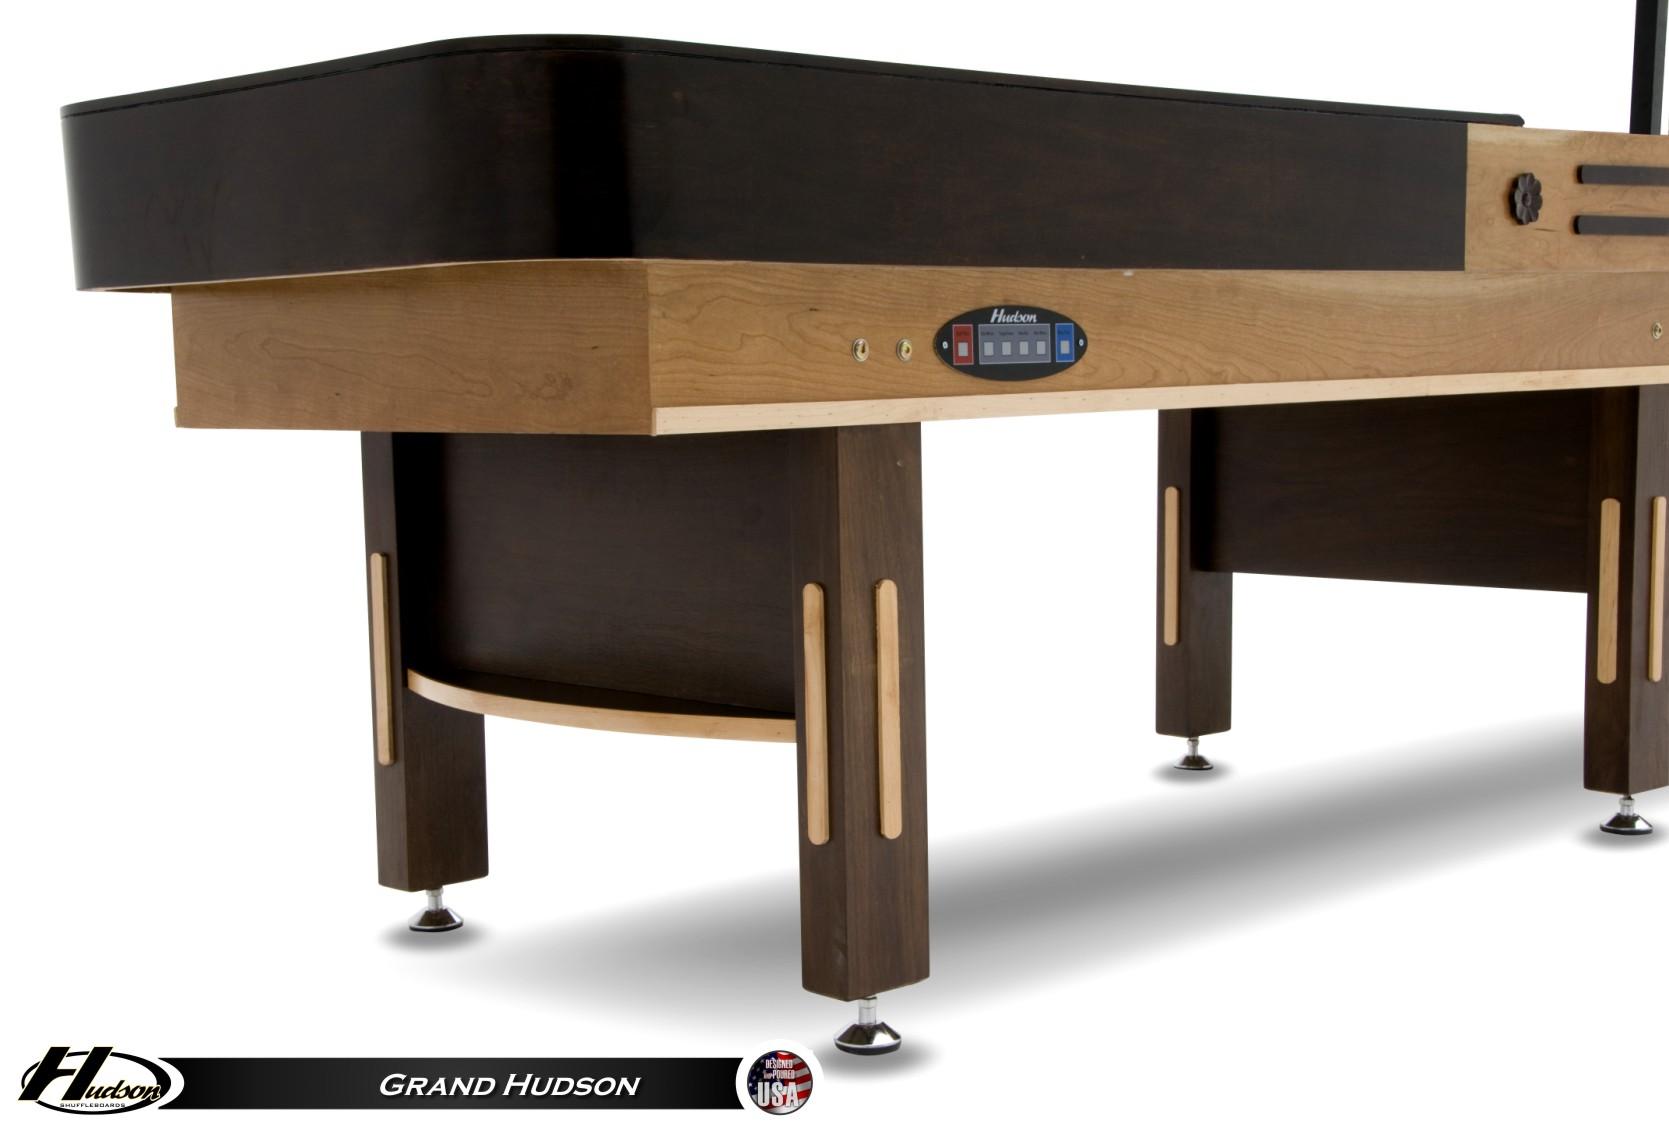 detail5 14' grand hudson shuffleboard table shuffleboard net  at reclaimingppi.co